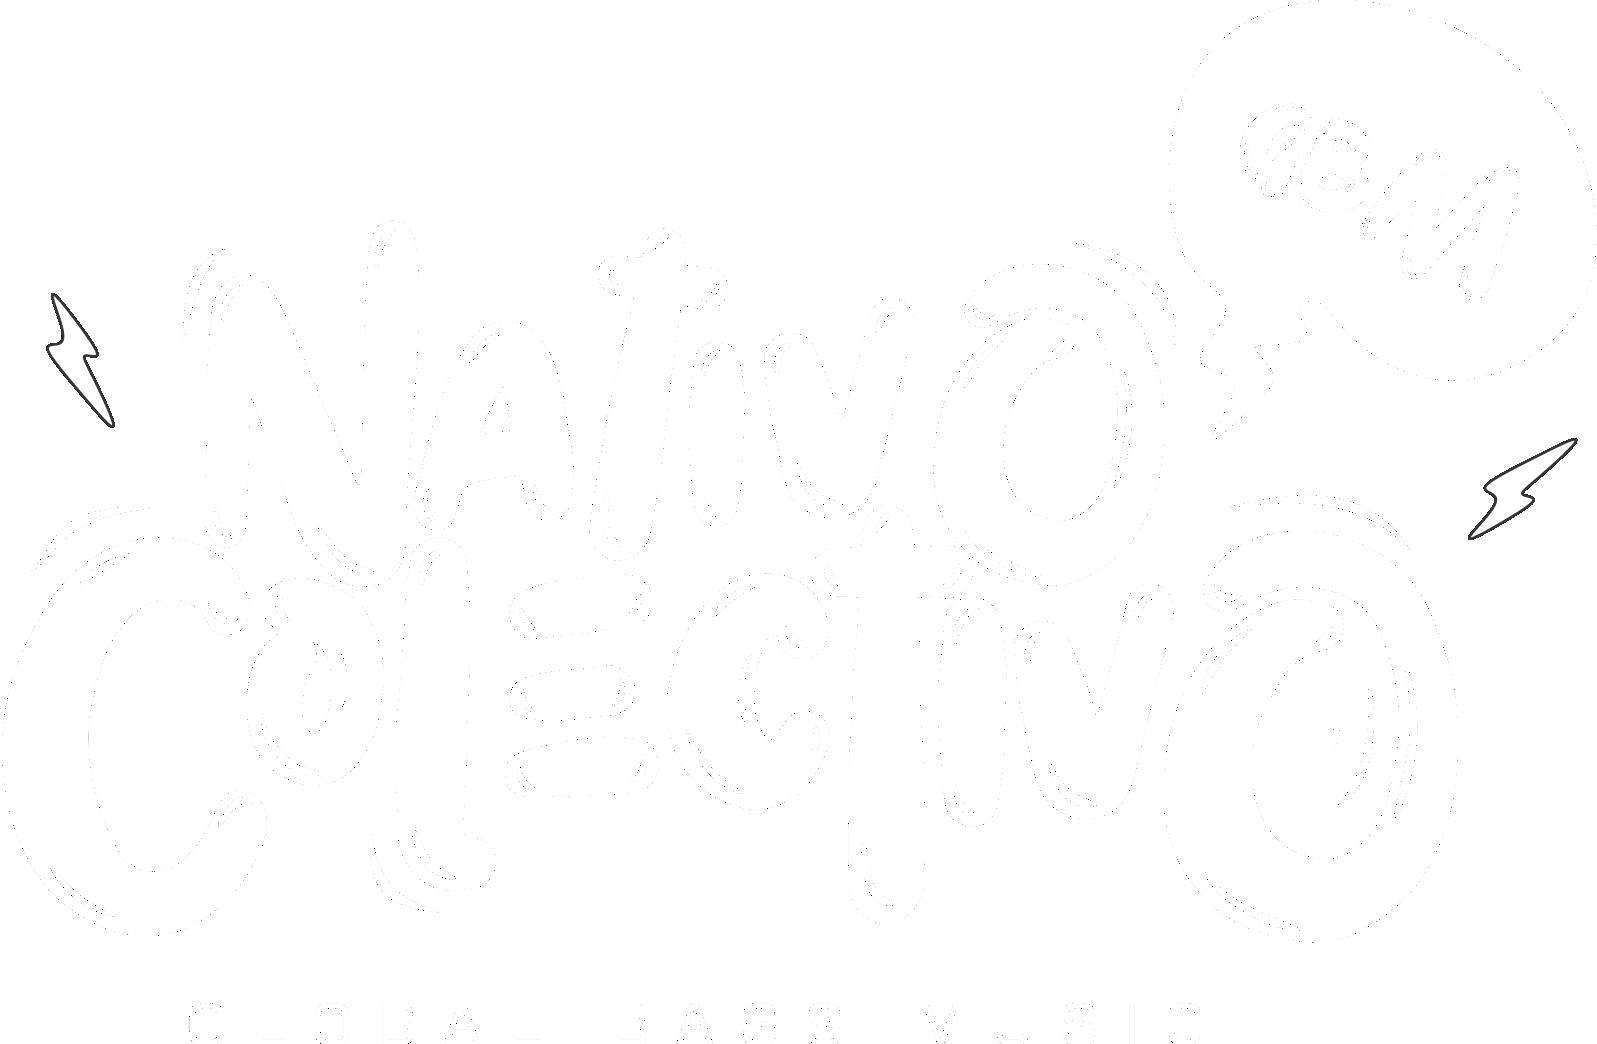 NATIVO COLECTIVO